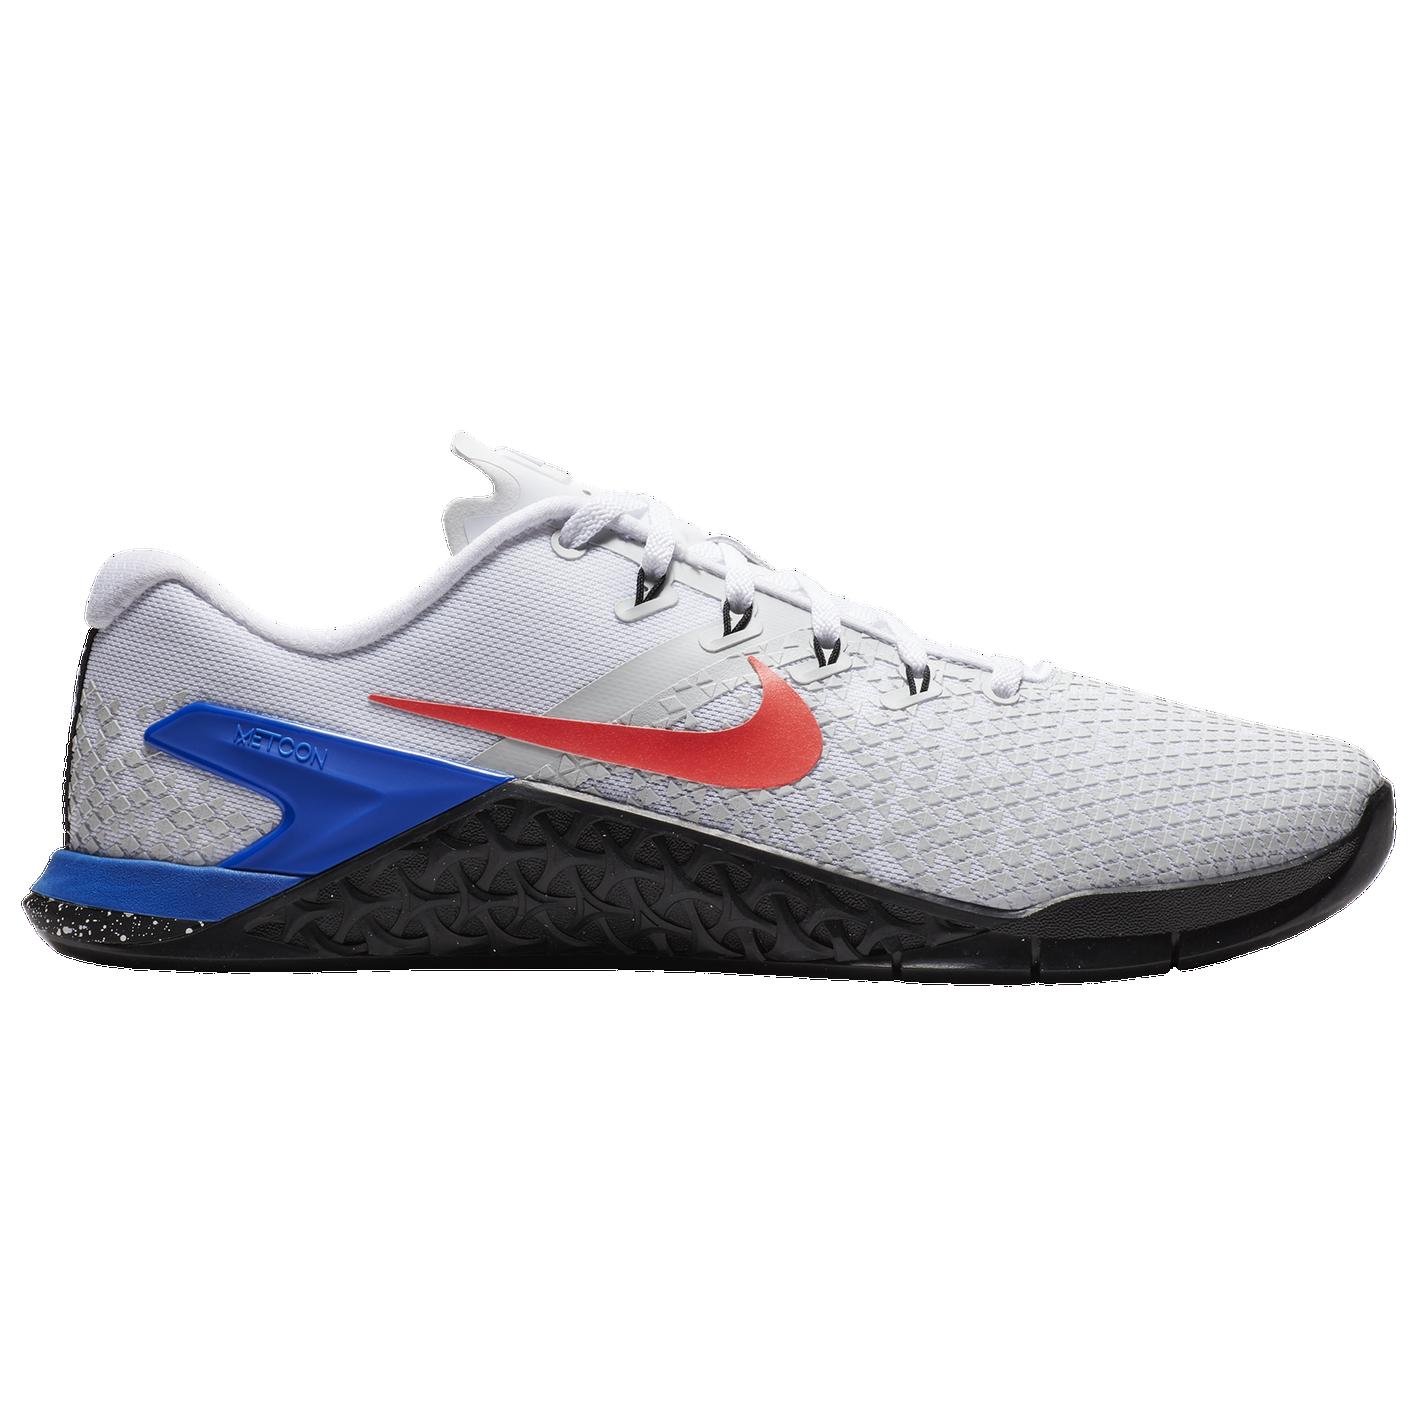 e12a629571e Nike Metcon 4 XD - Men s - Strength Weight Training - Shoes - White ...